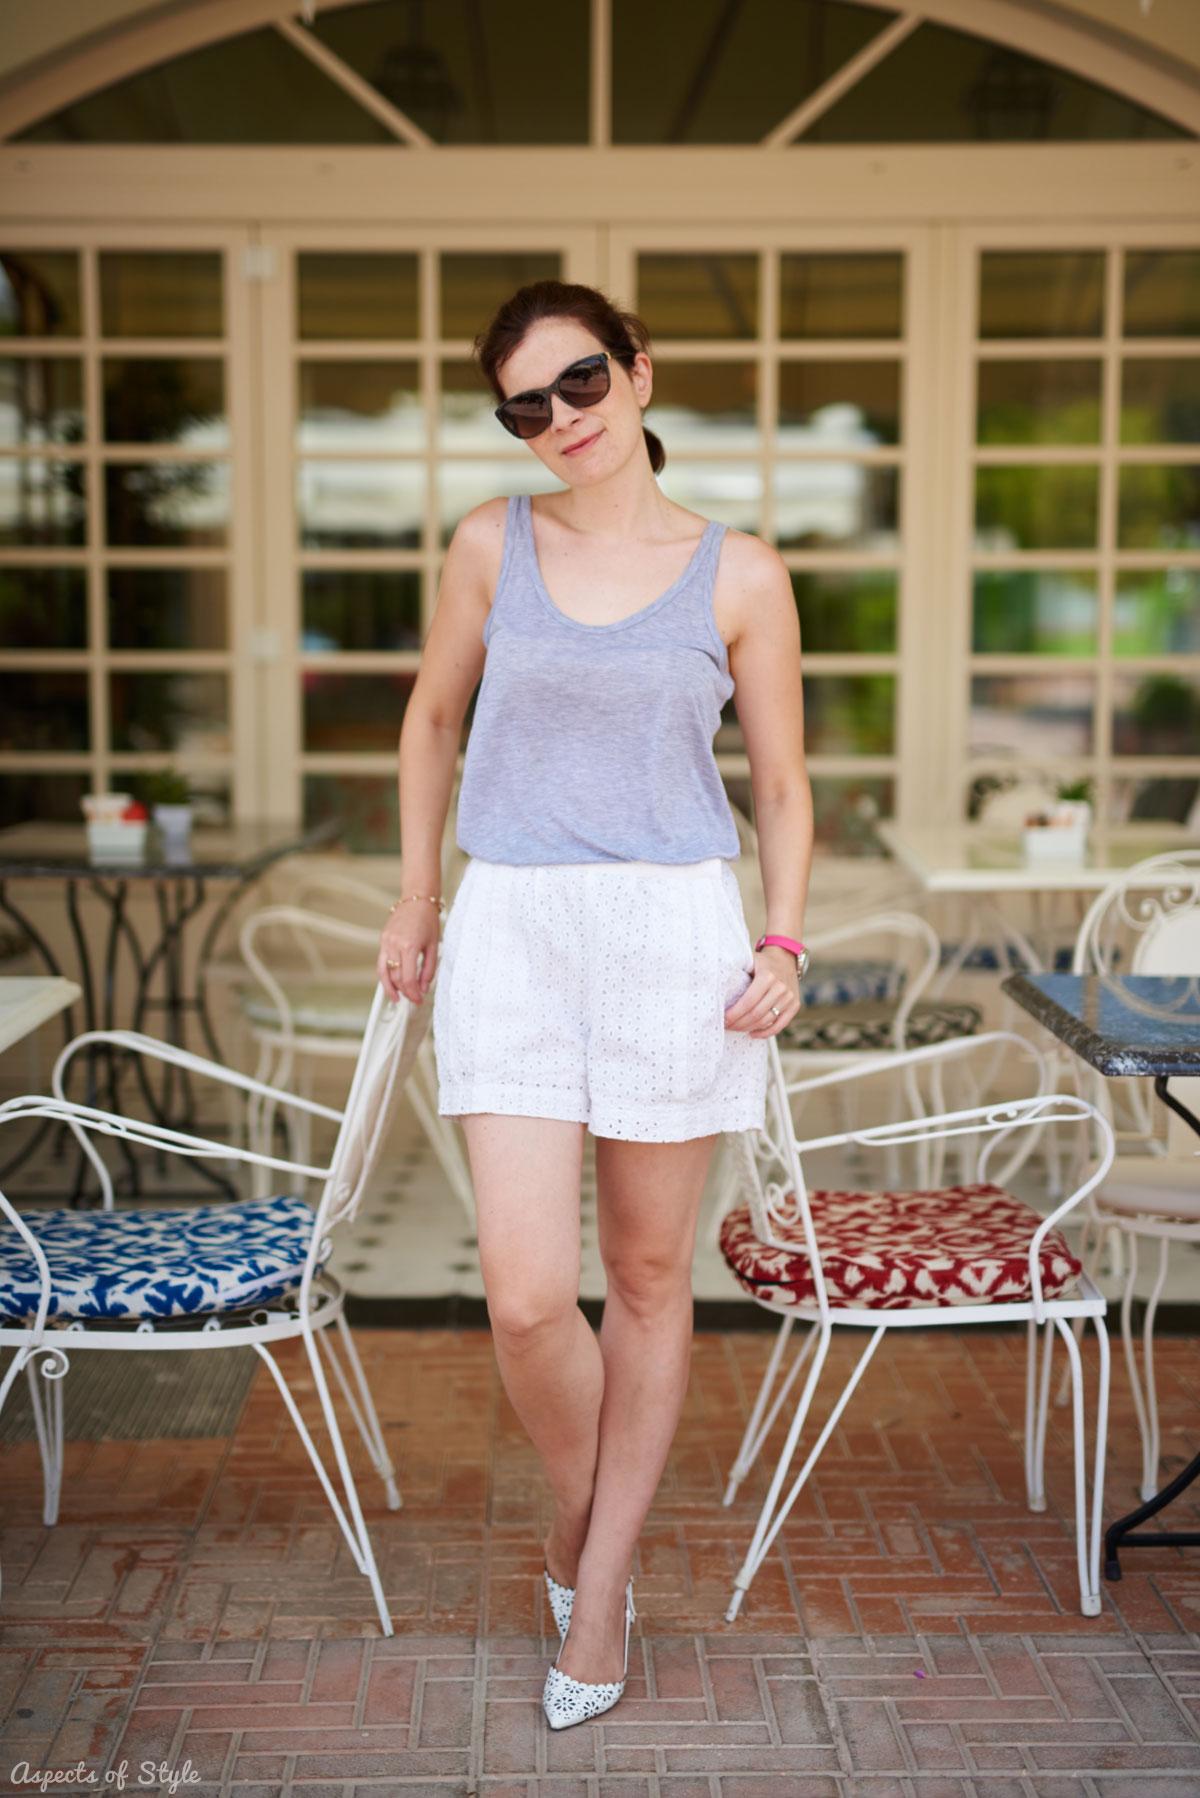 Zara tank top and H&M white shorts